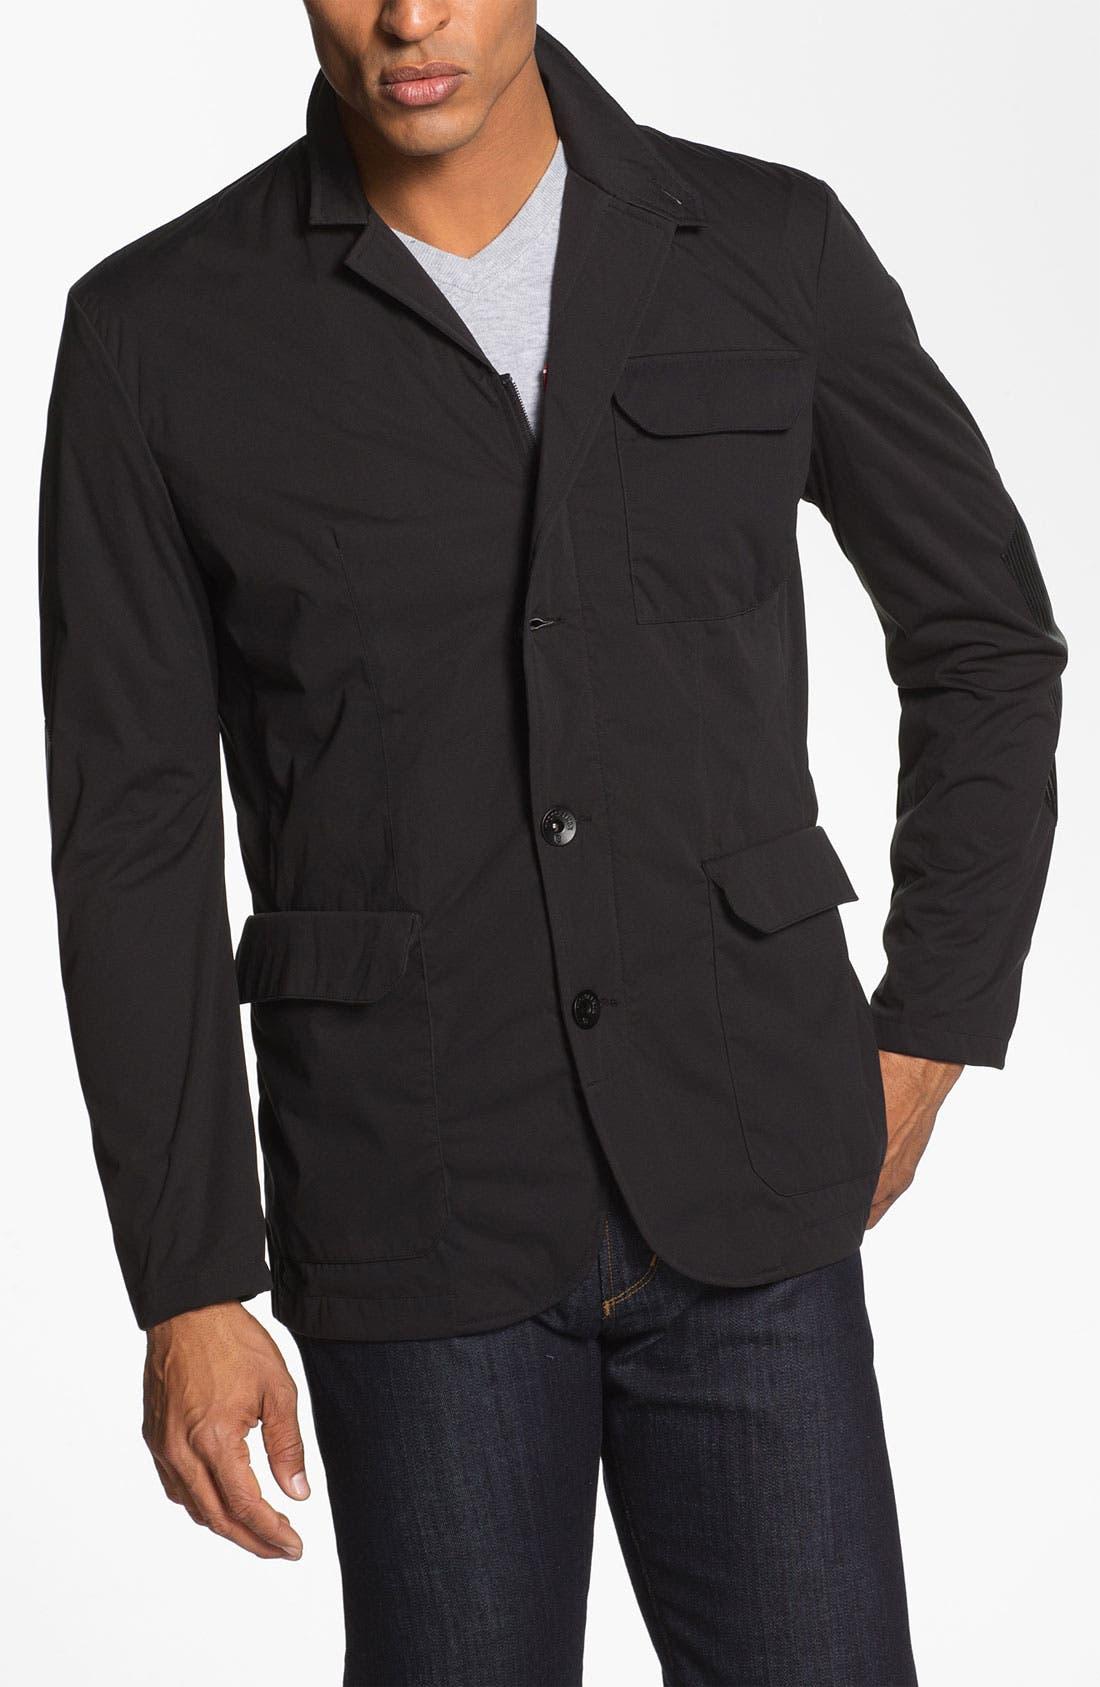 Main Image - Victorinox Swiss Army® 'Jet Stream' Blazer Style Jacket (Online Only)